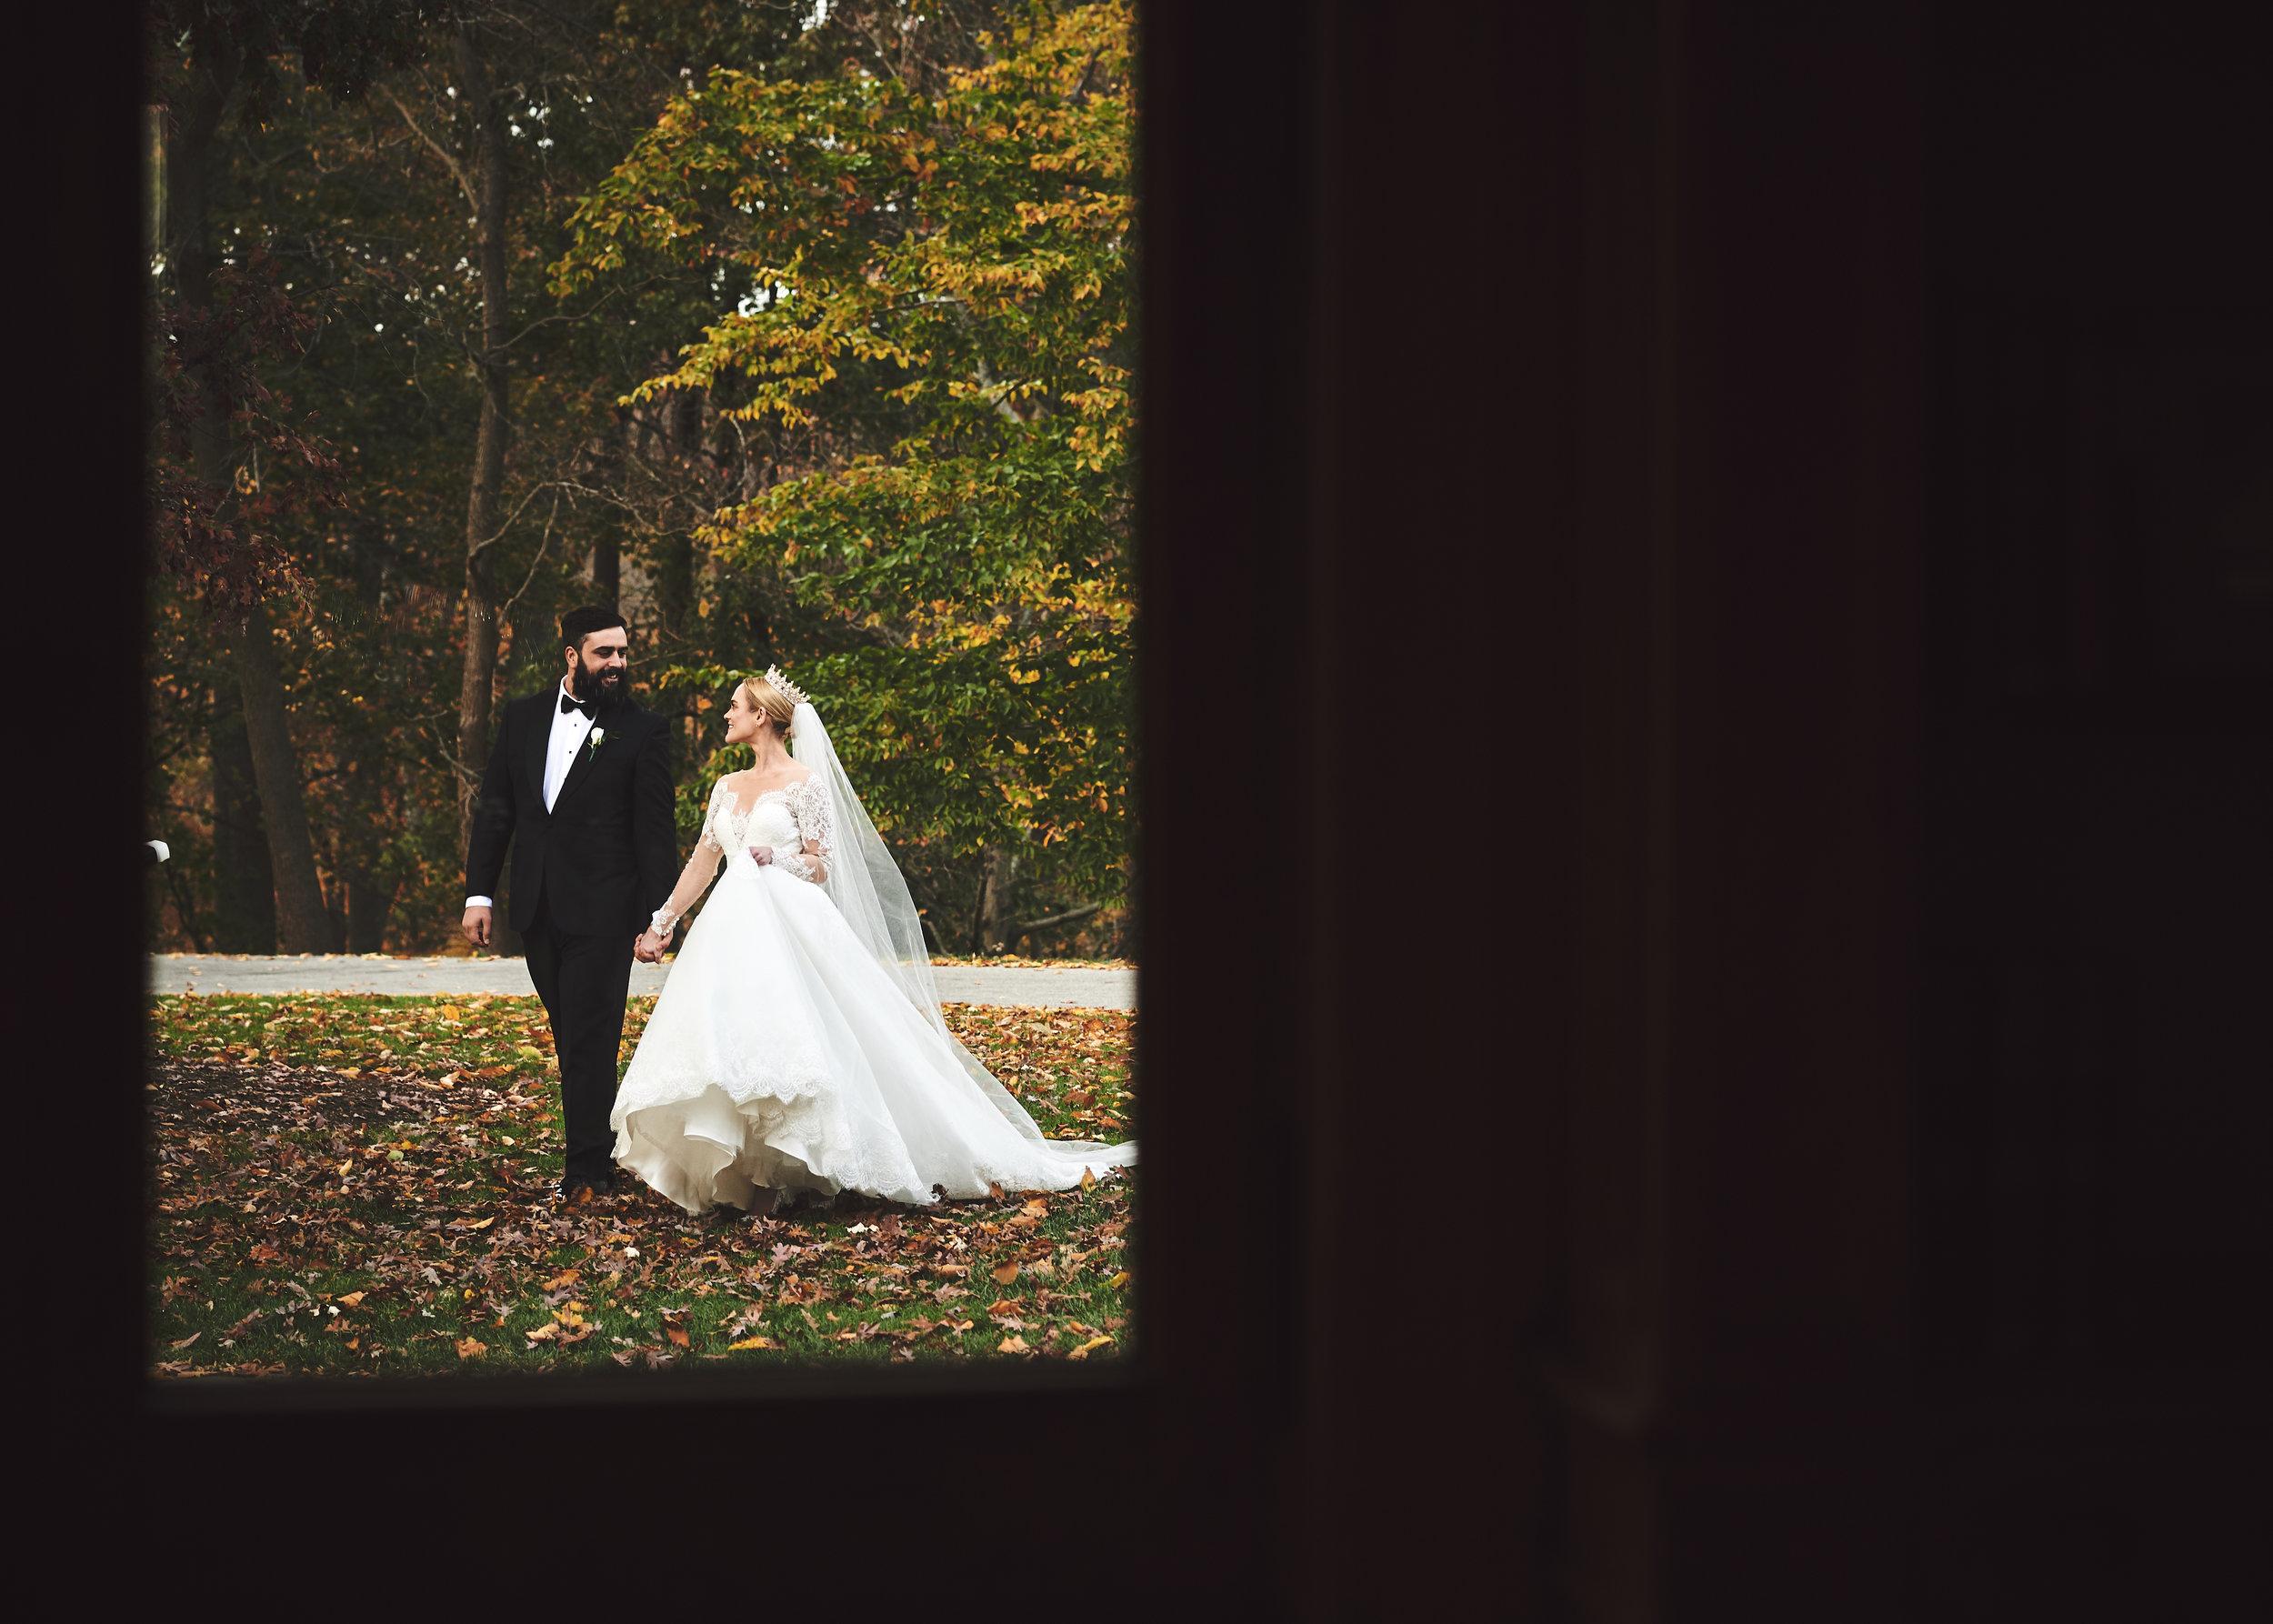 171111_Chris&Quinn_Wedding_0551.jpg